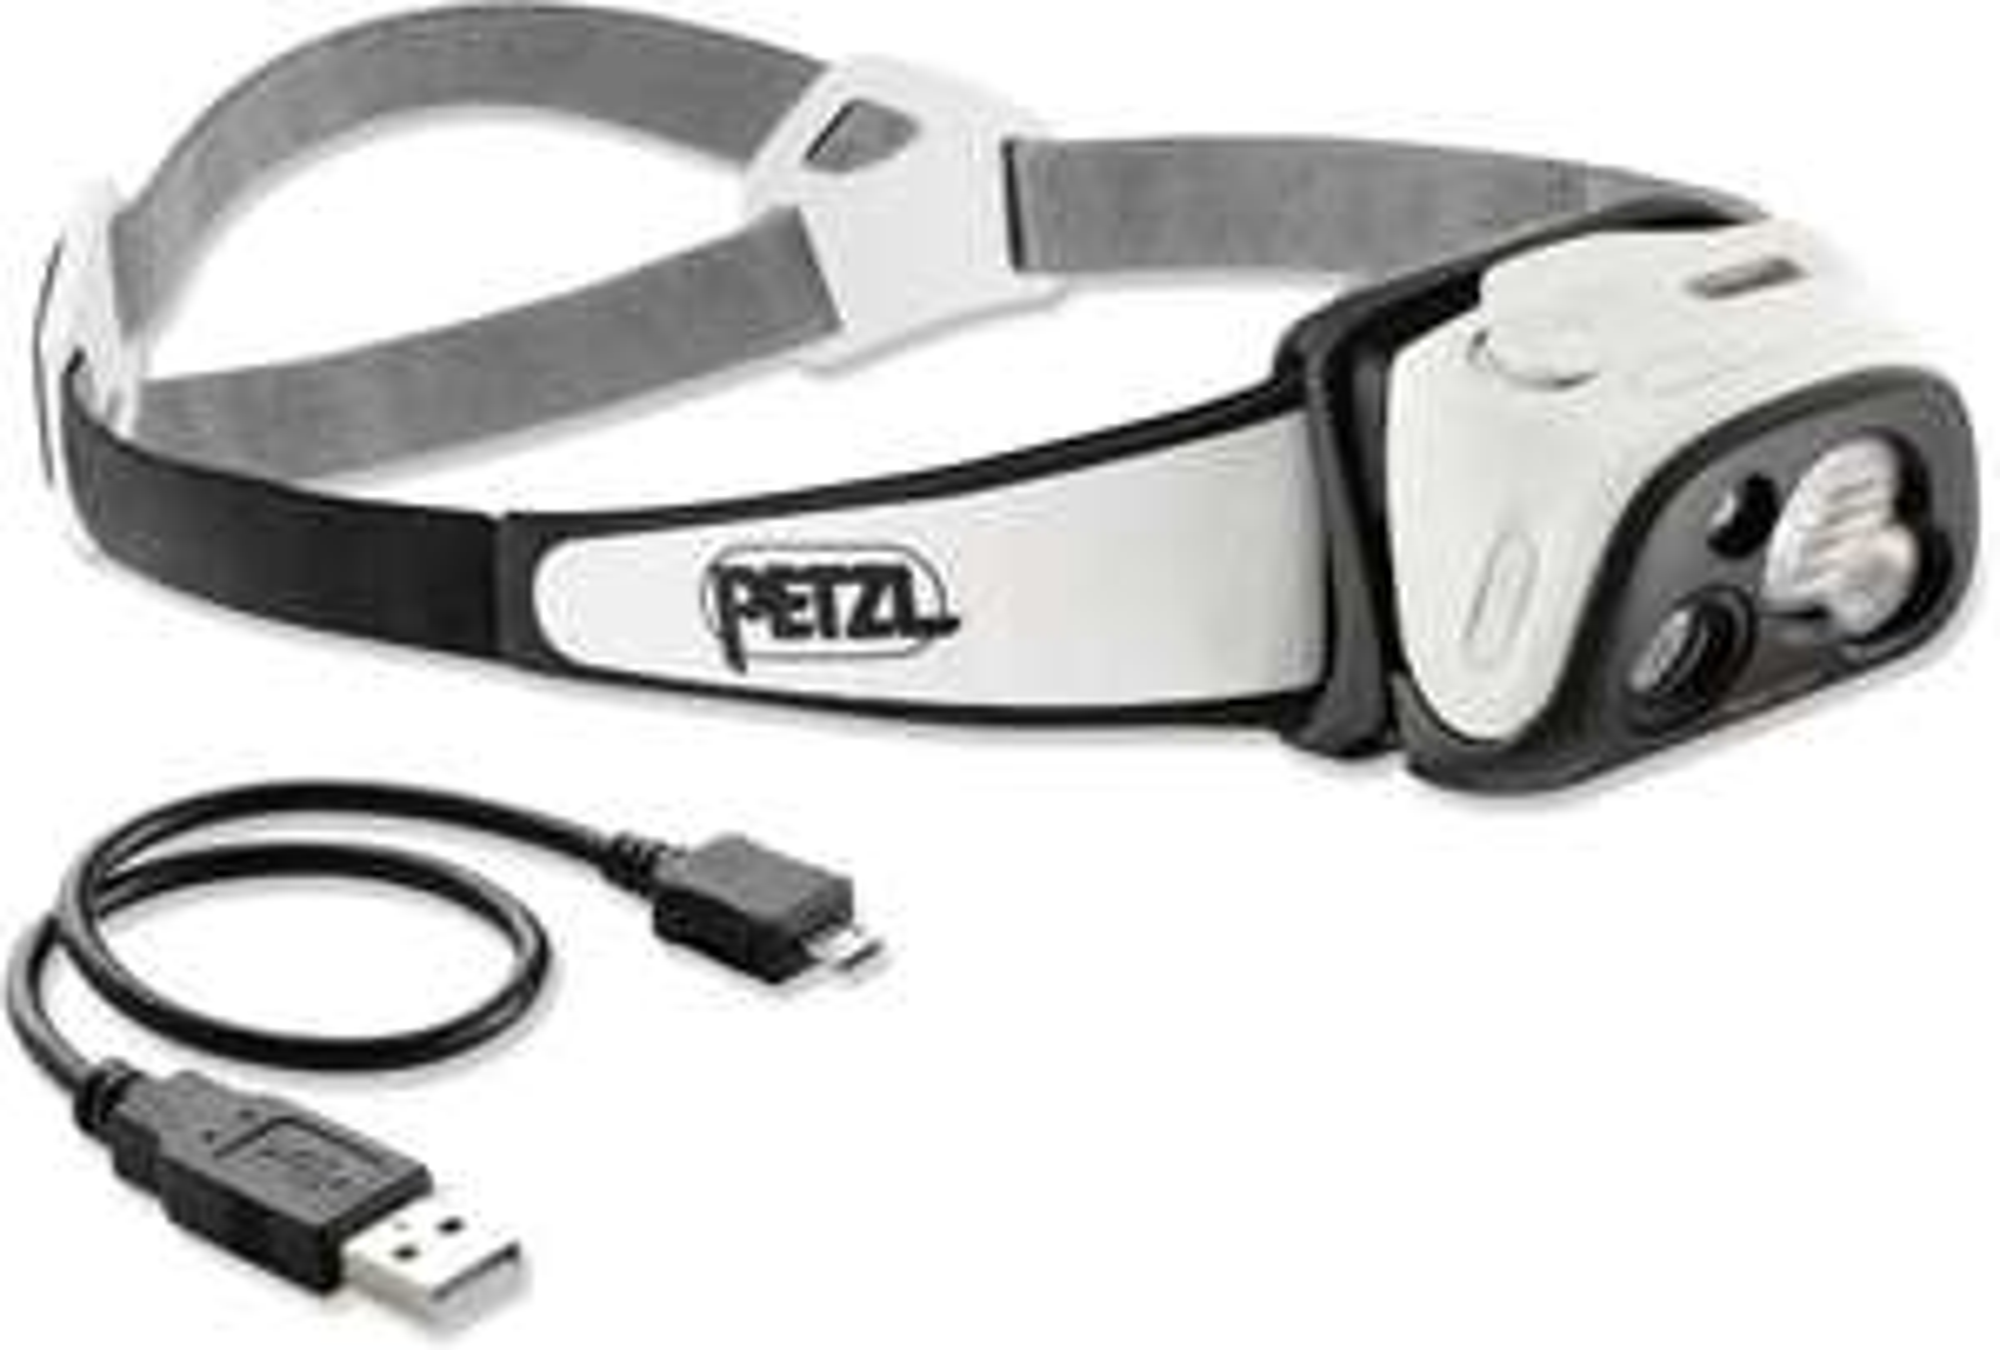 Lampe frontale rechargeable Petzl Tikka RXP 215 Lumens